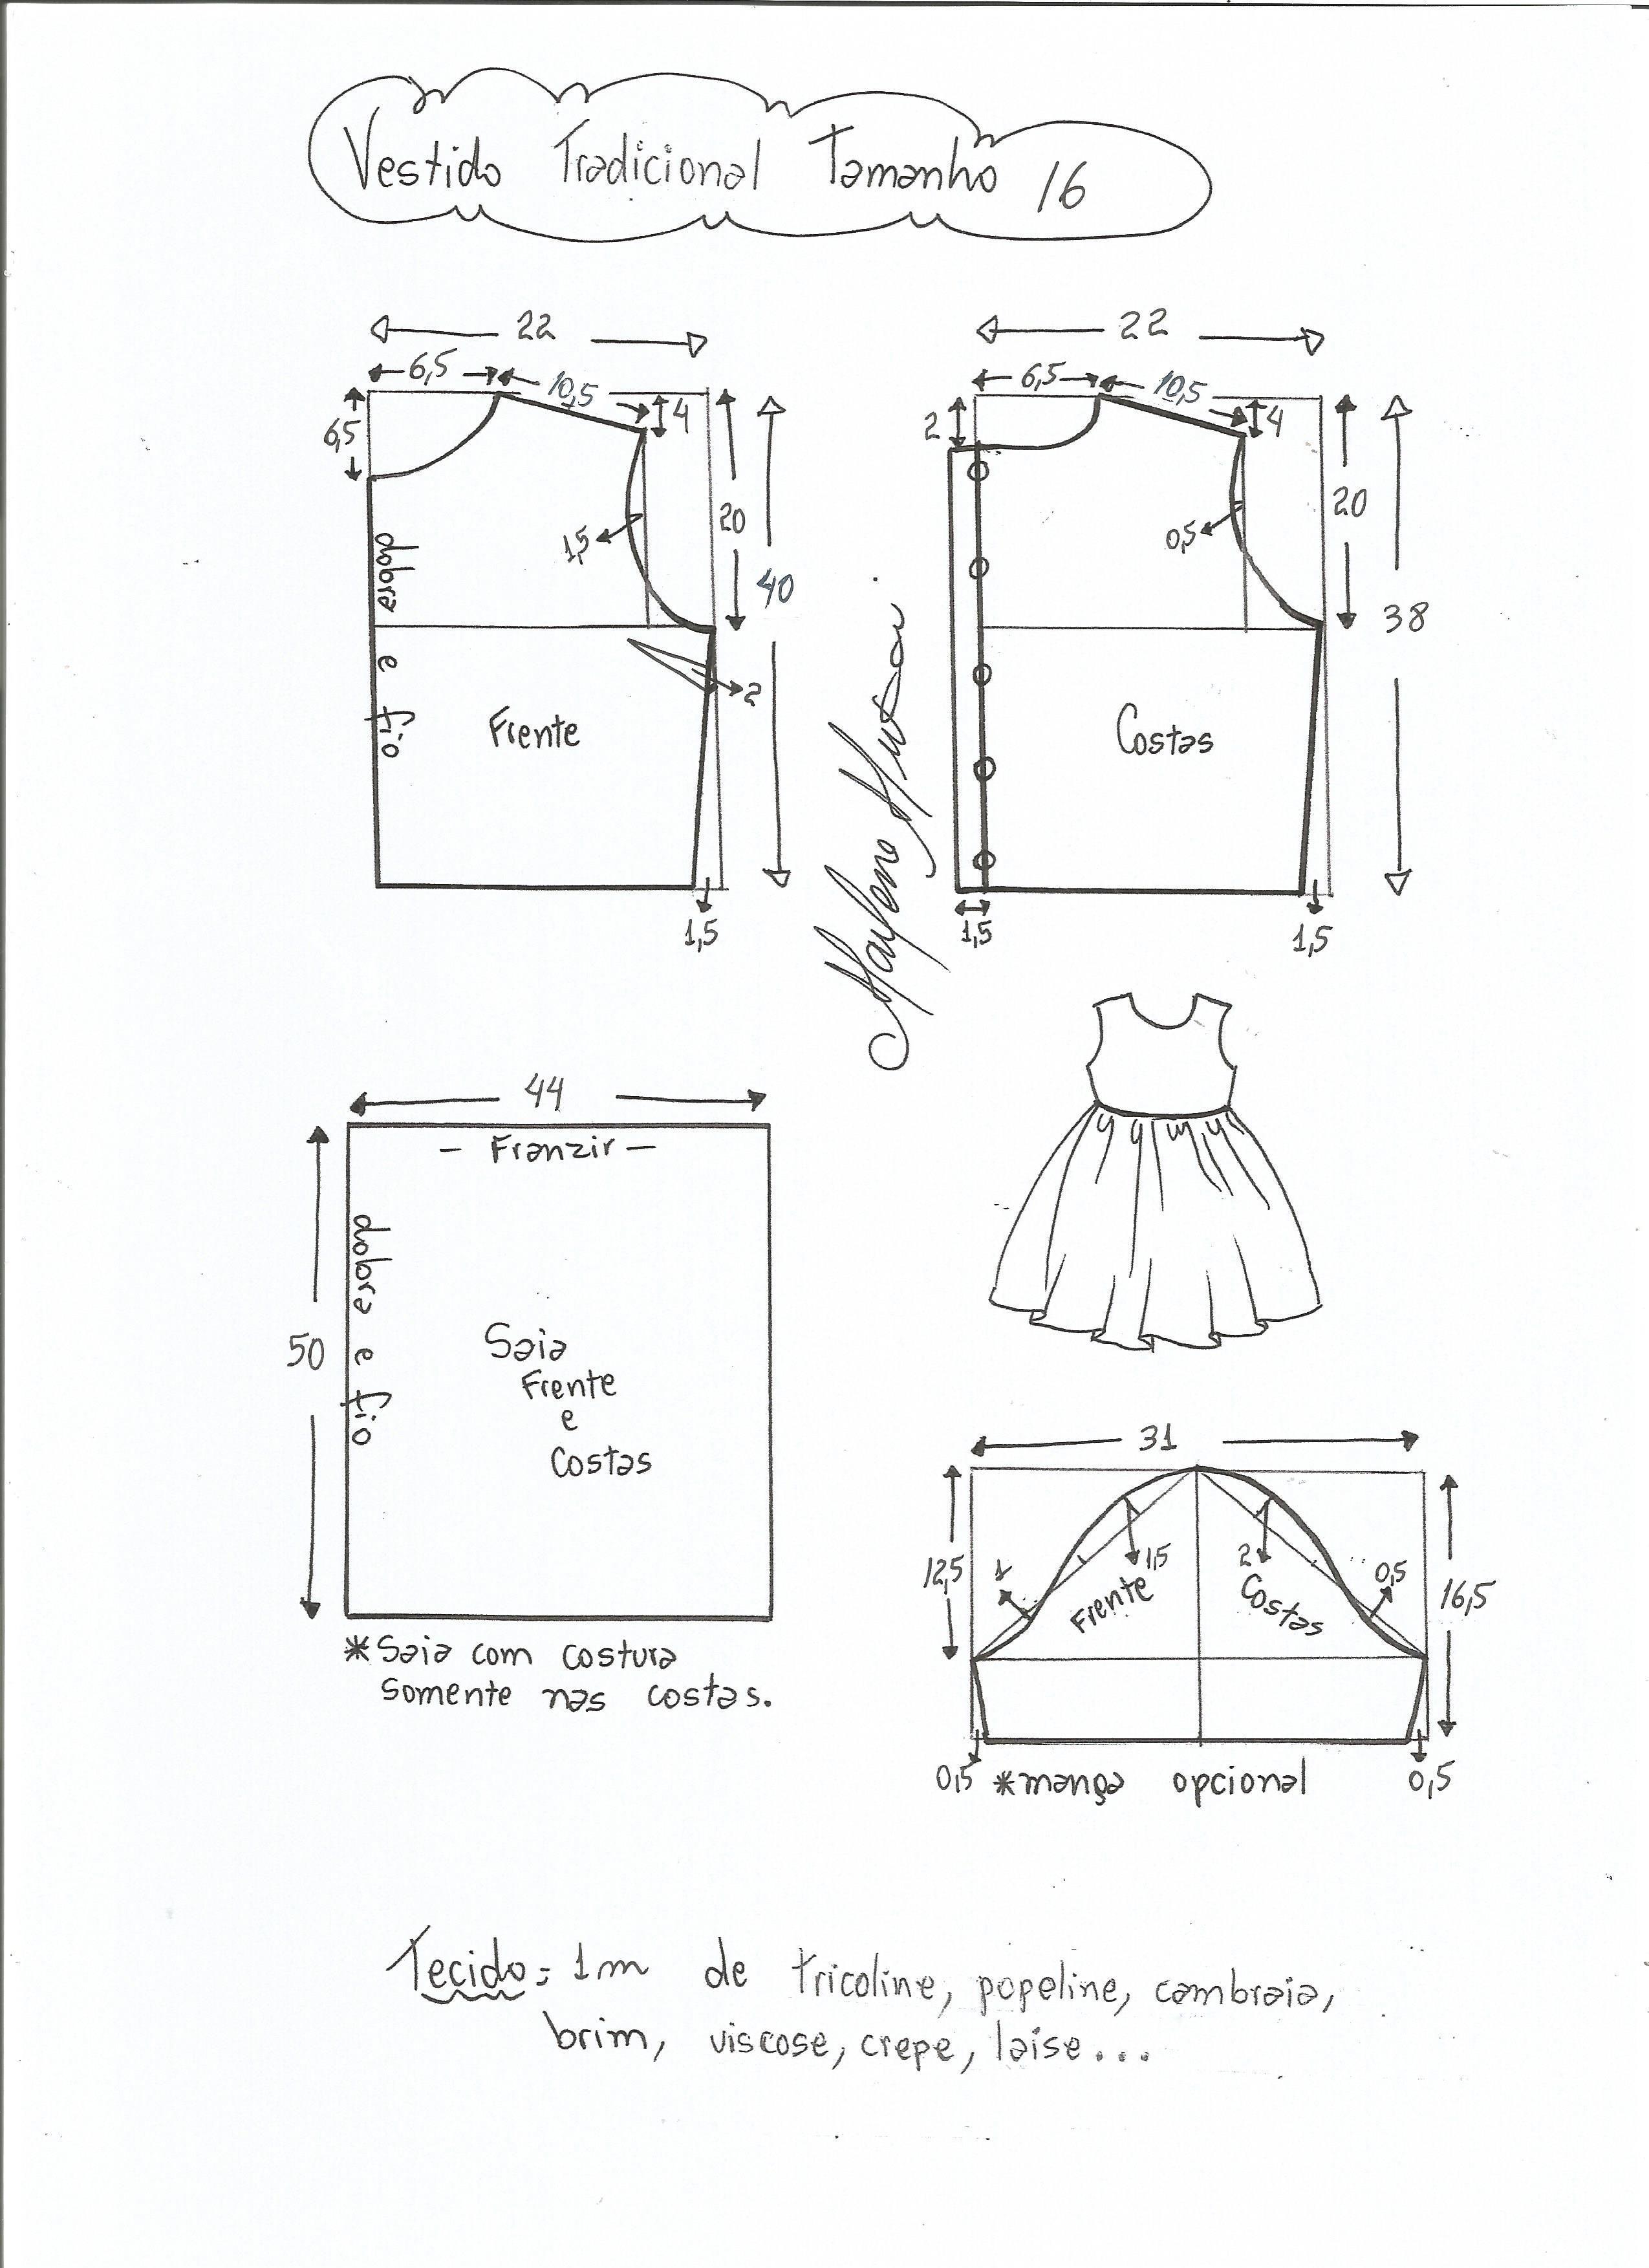 Pin de veronica castrillon en costura | Pinterest | Patrones de ropa ...